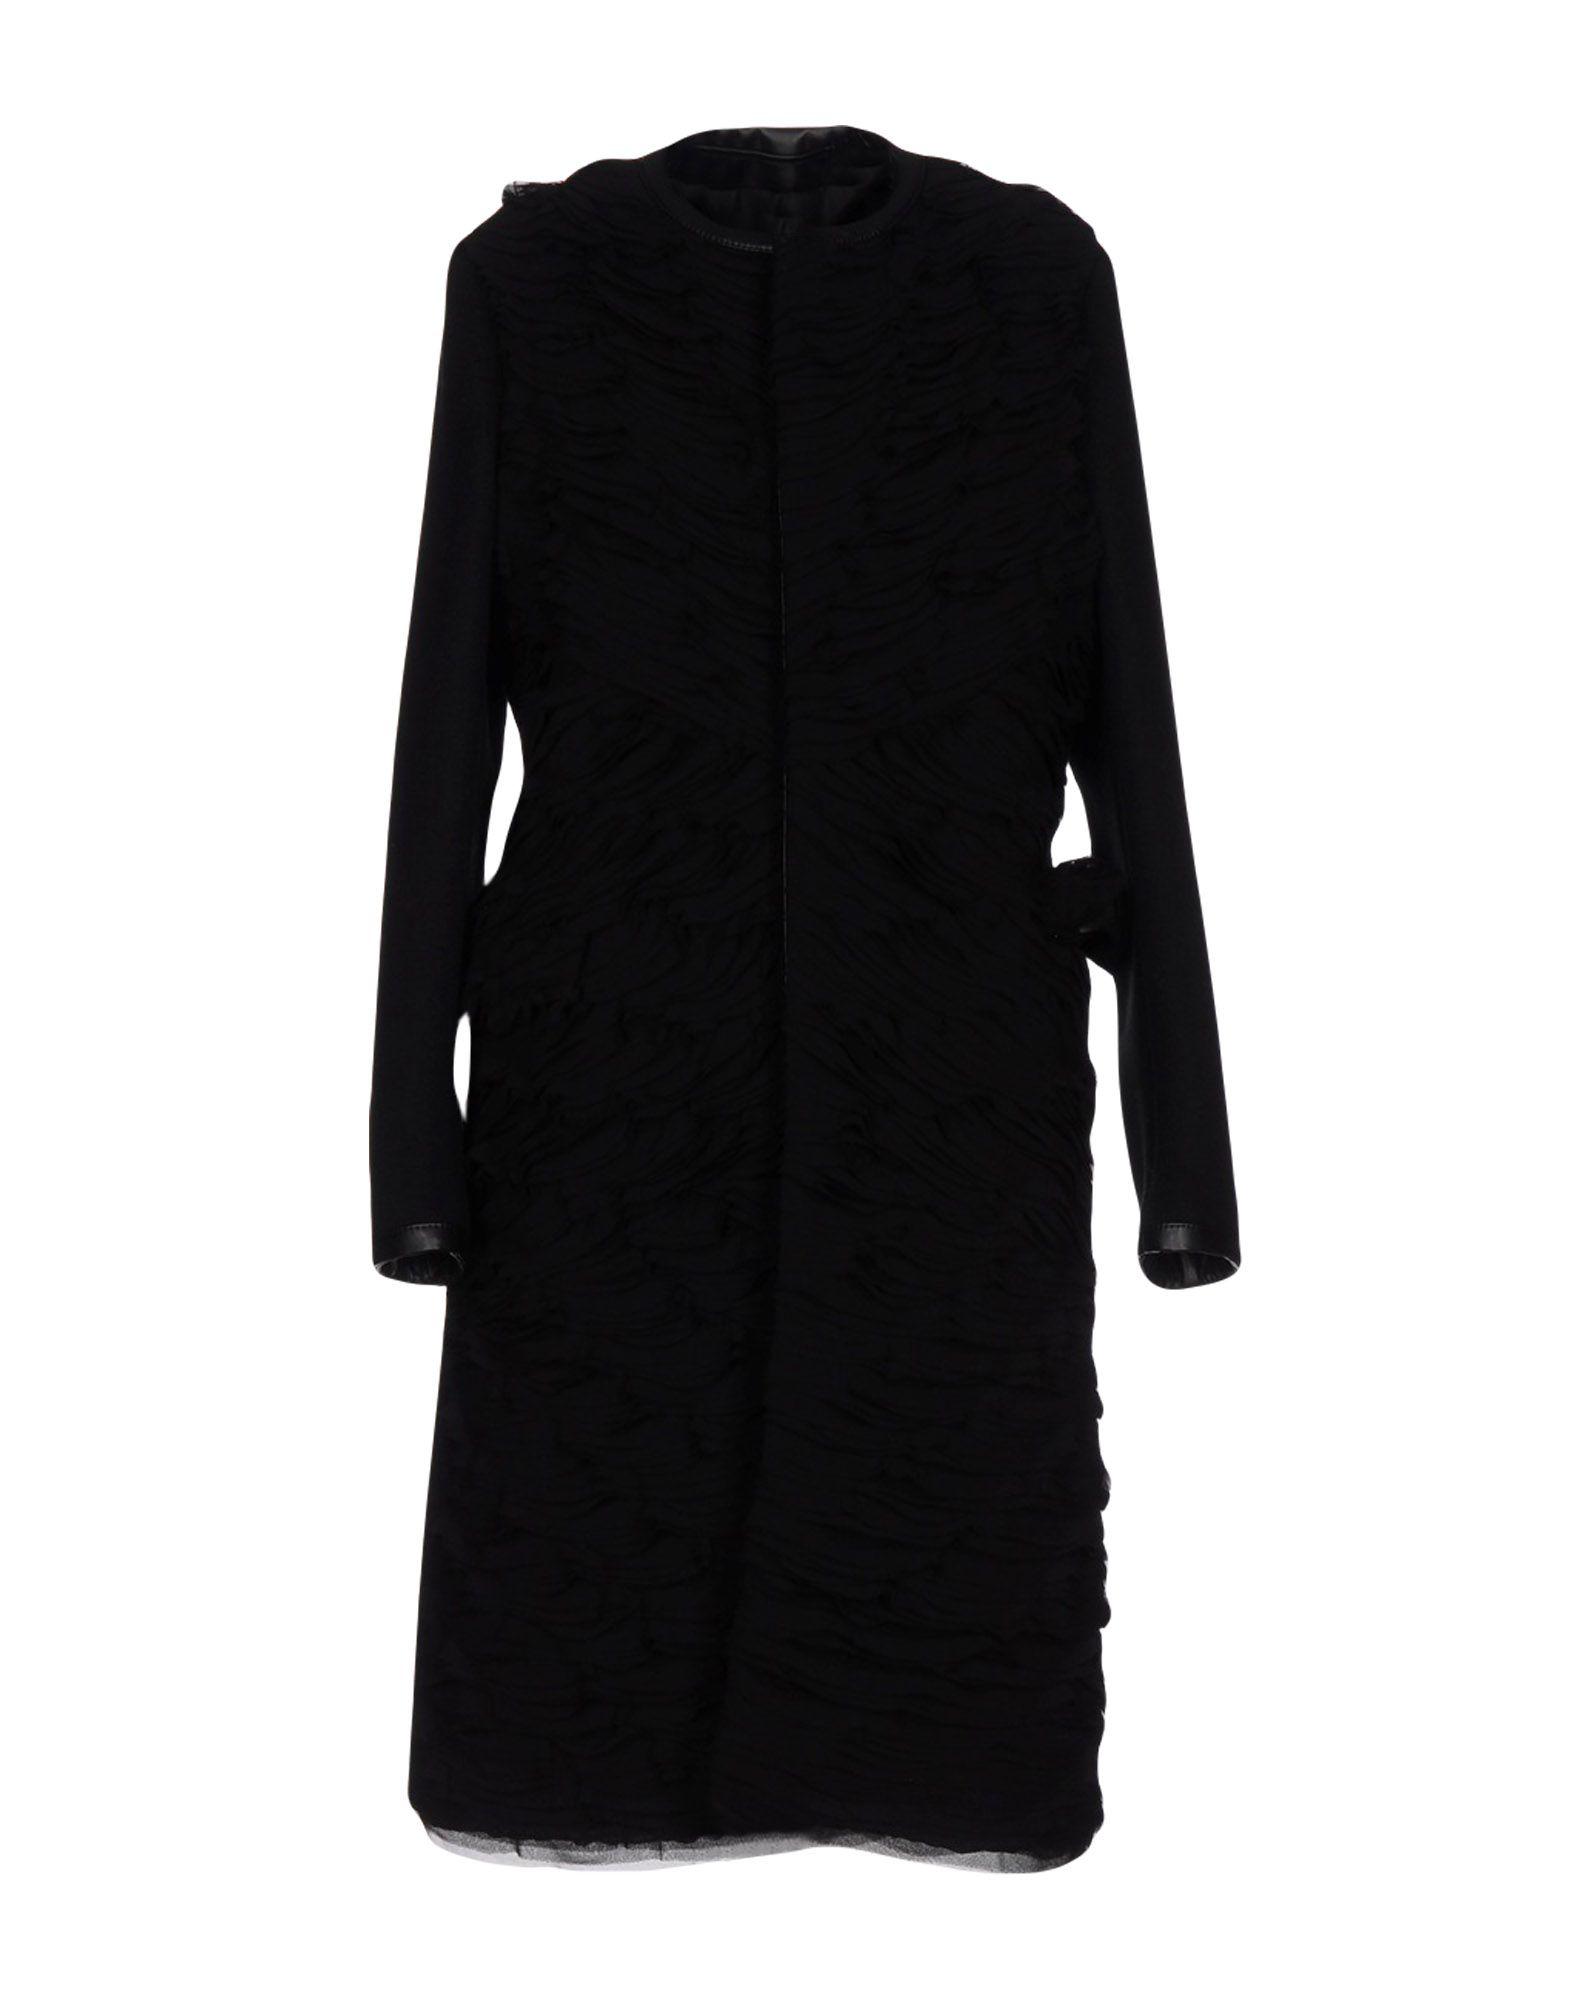 NOIR KEI NINOMIYA Coats in Black